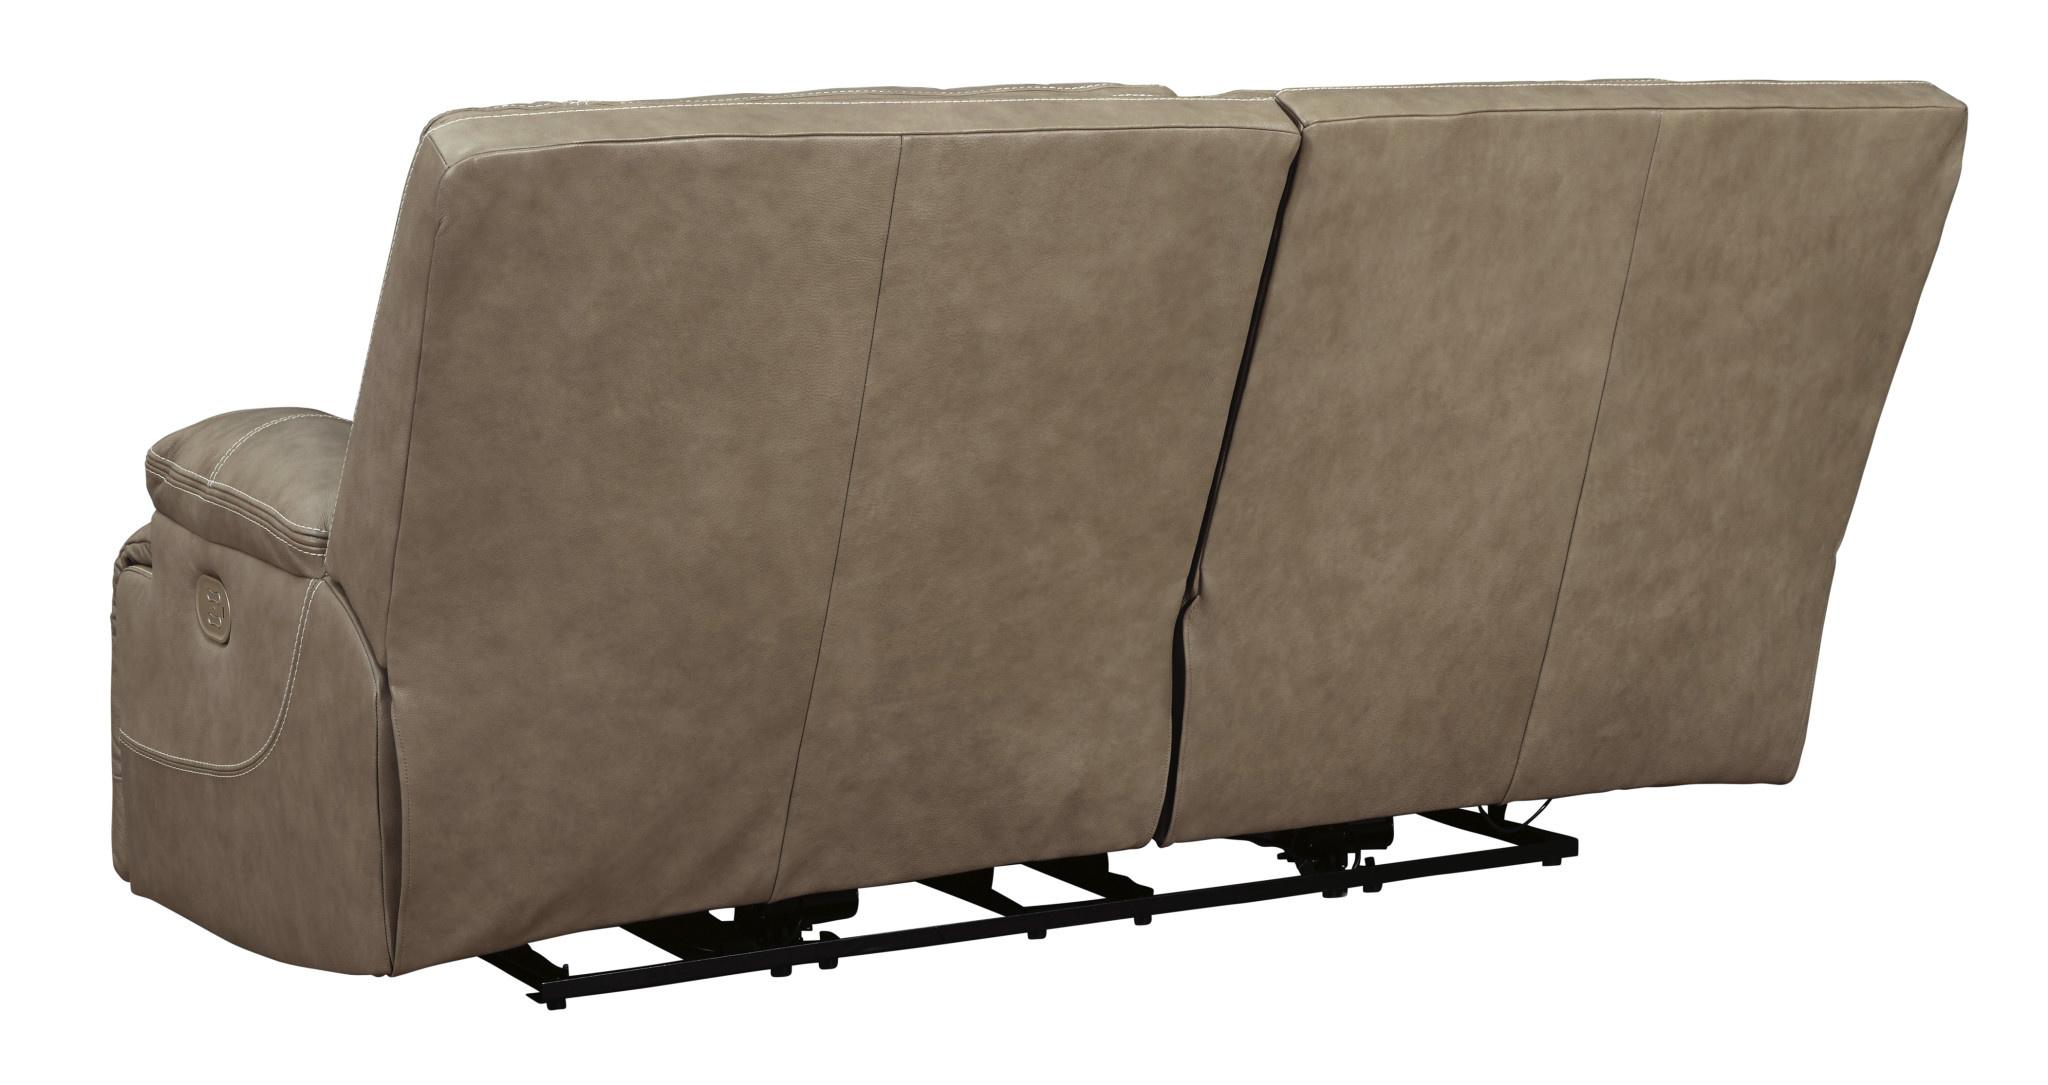 Signature Design 2 Seat Power Reclining Sofa w/ Adjustable Headrest, Ricmen, Putty Color U4370247